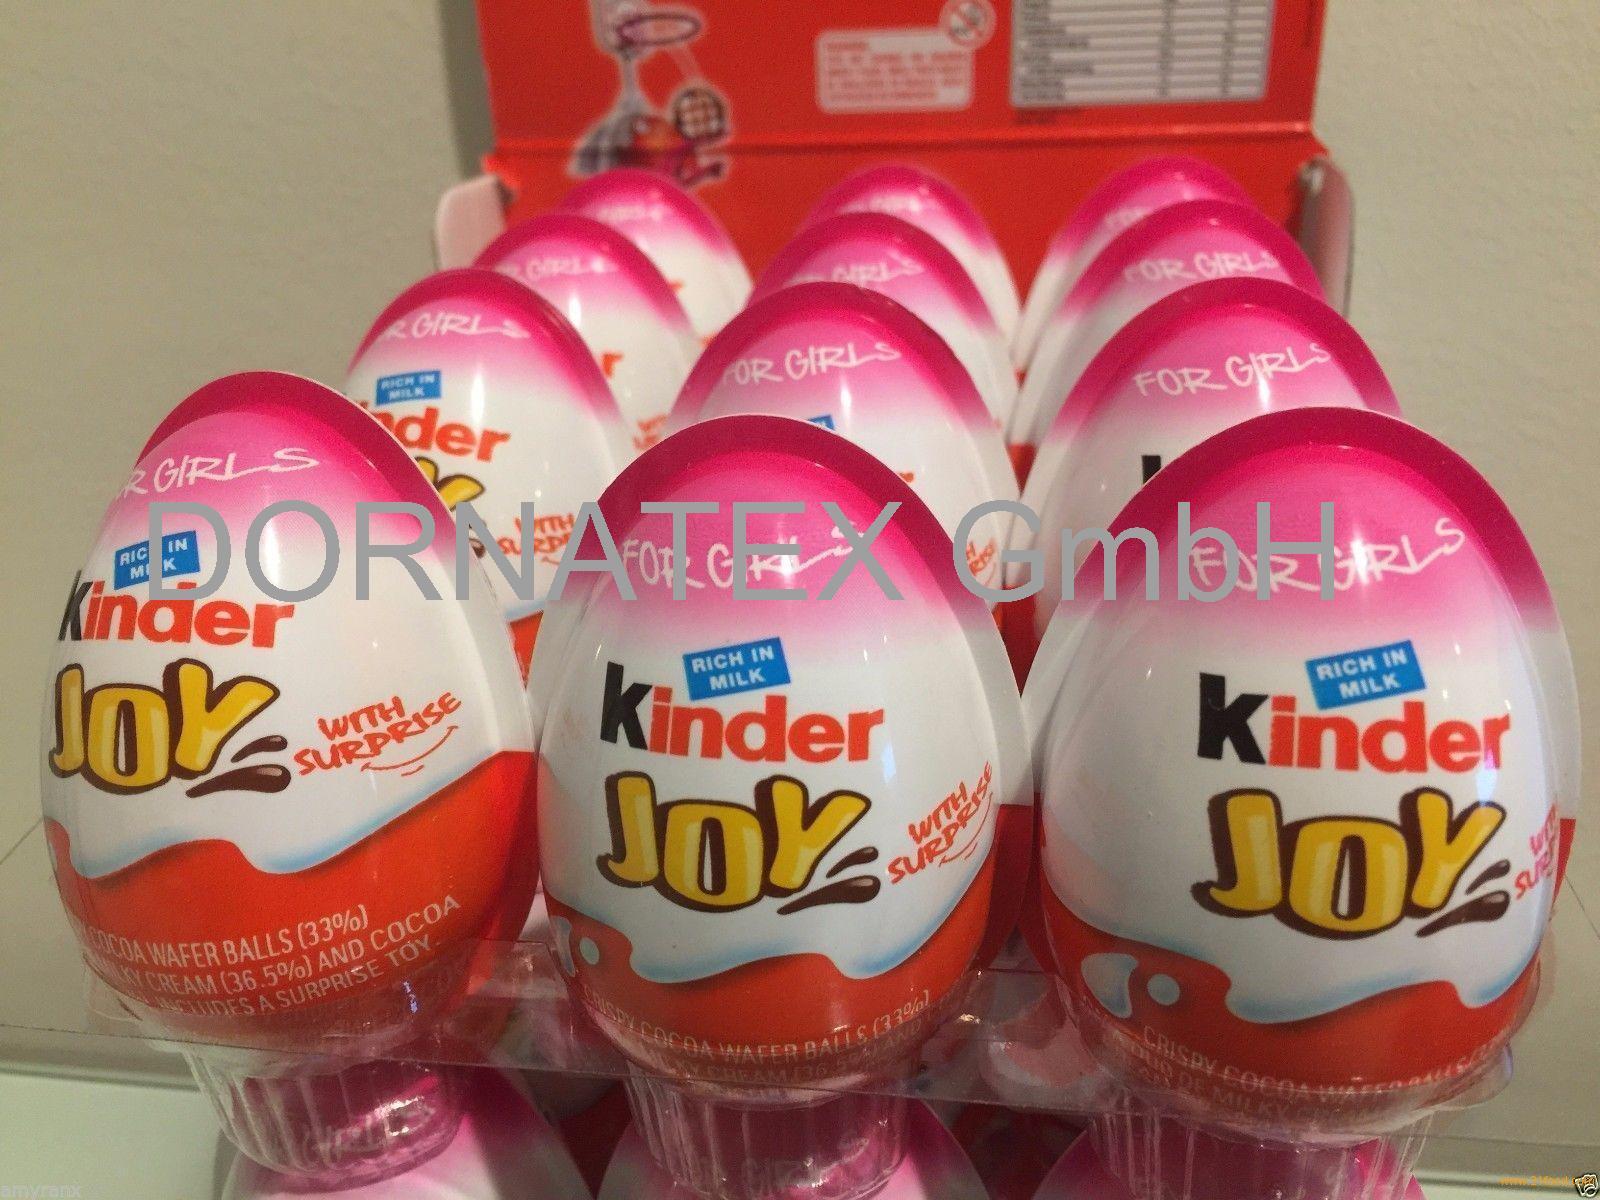 T30 375g Ferrero Rocher Kinder Surprise for sale